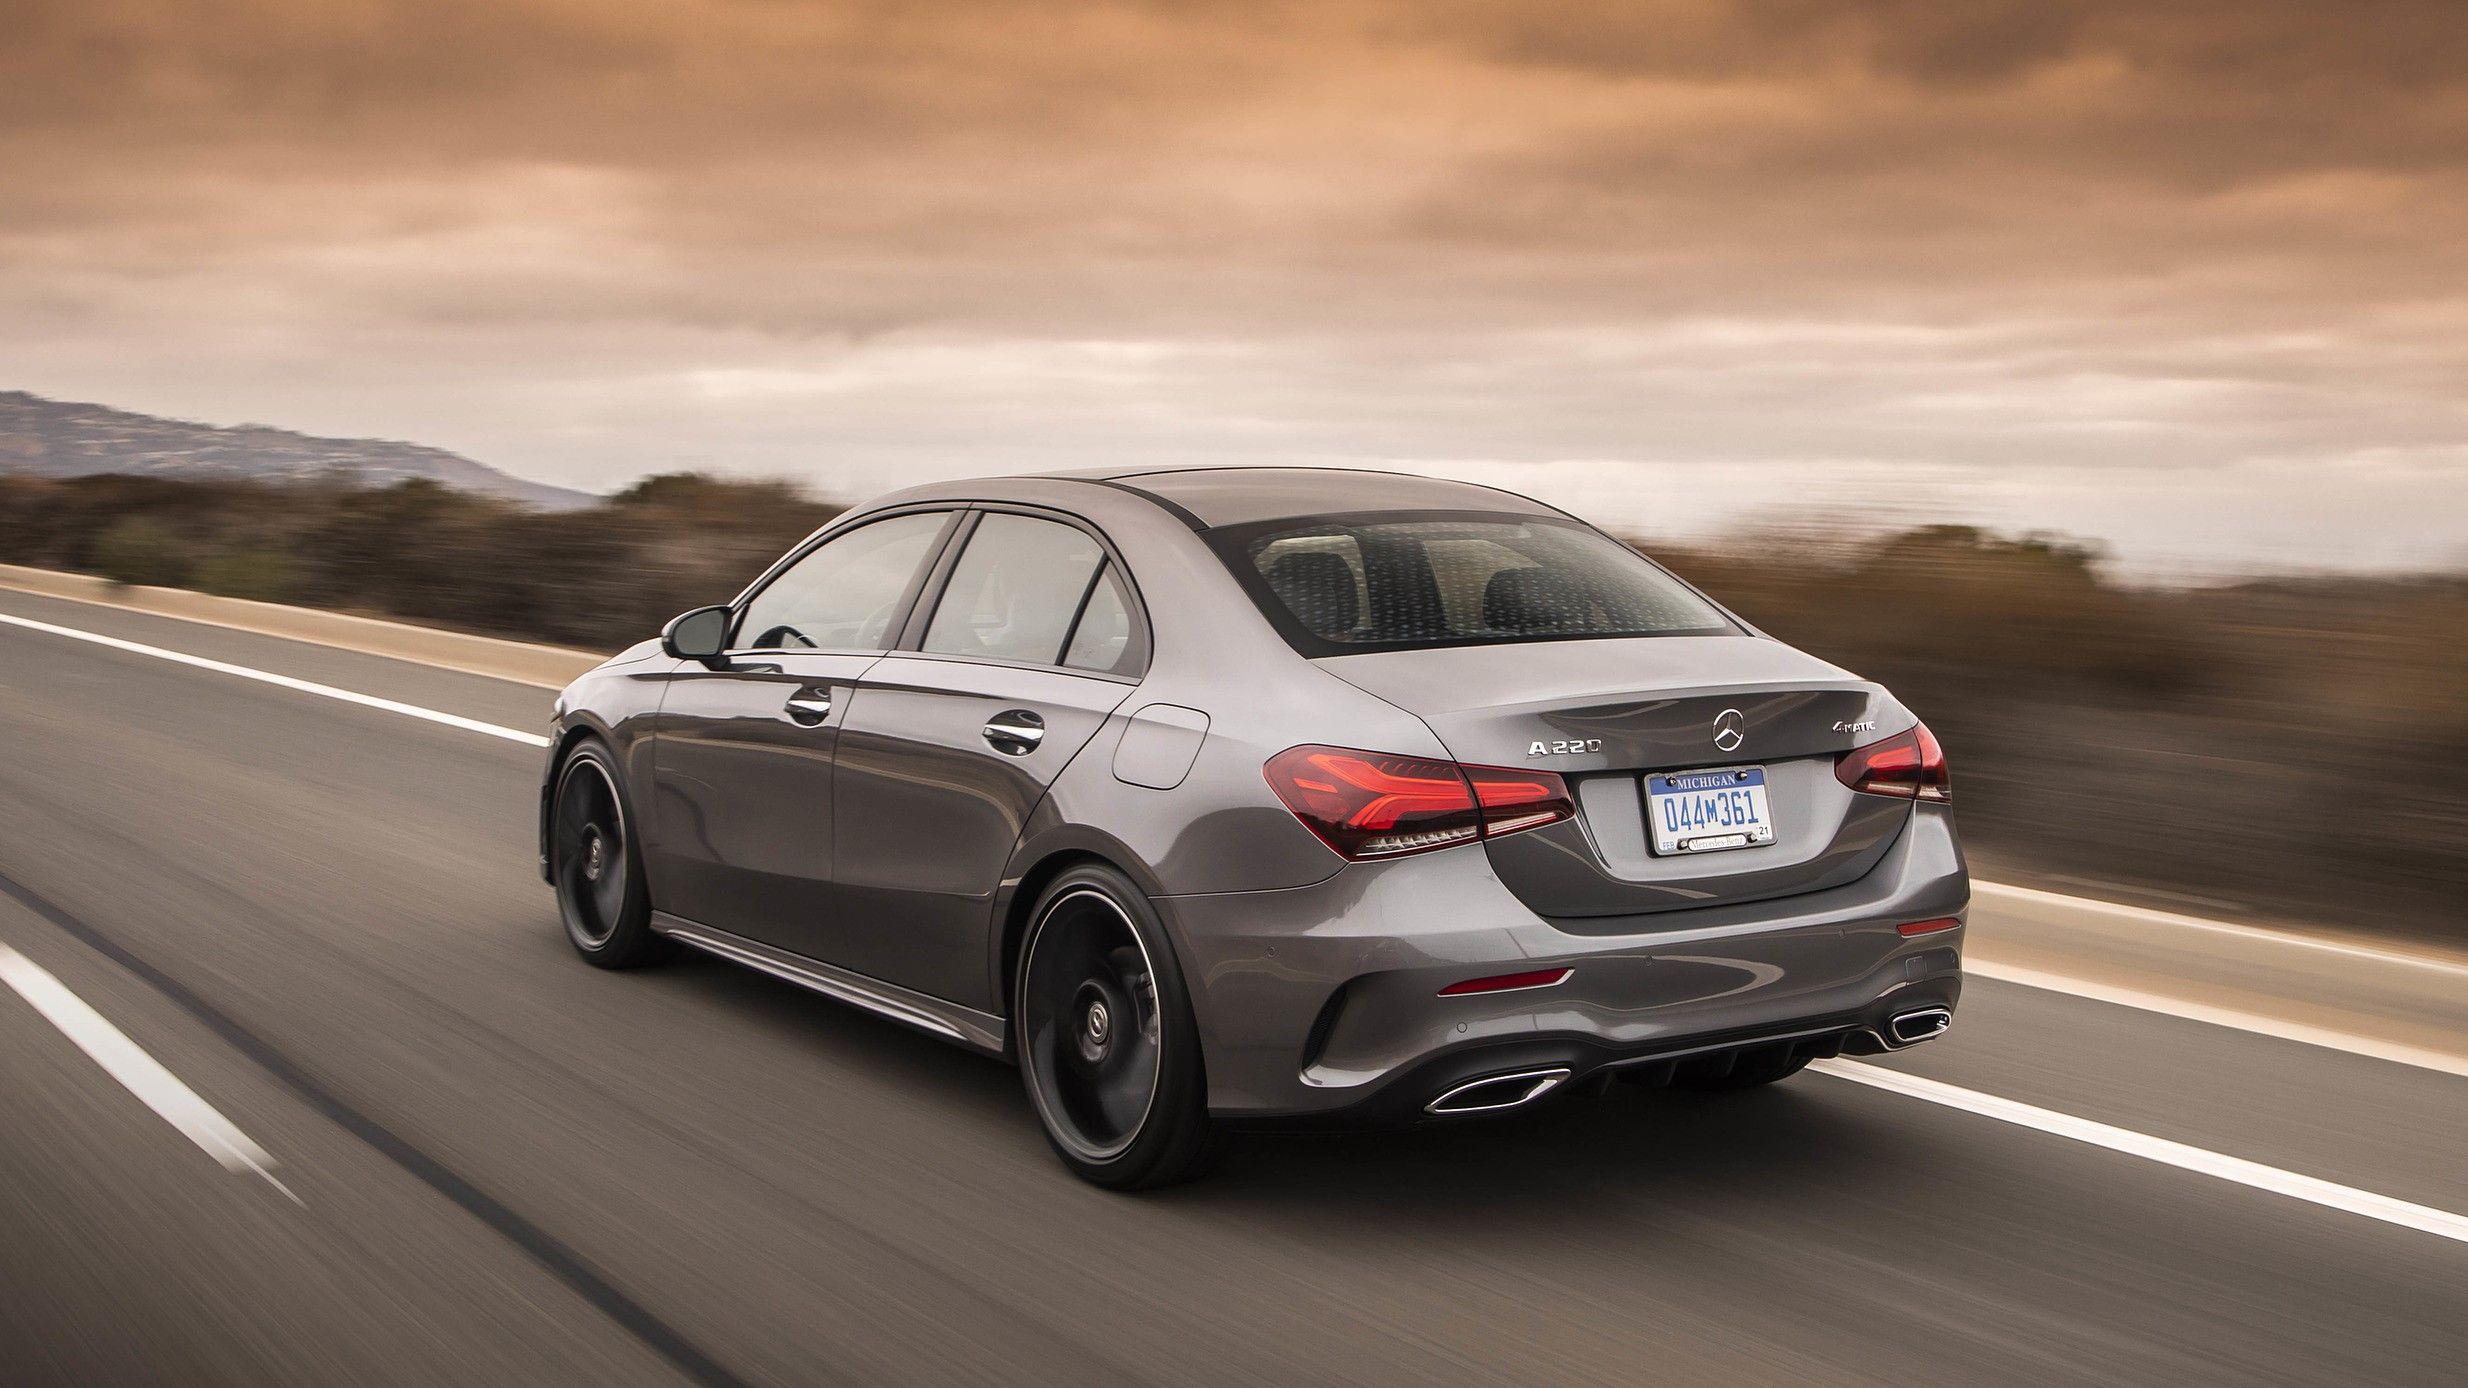 2021 Mercedes-Benz A-Class - Pricing, Performance, MPG ...